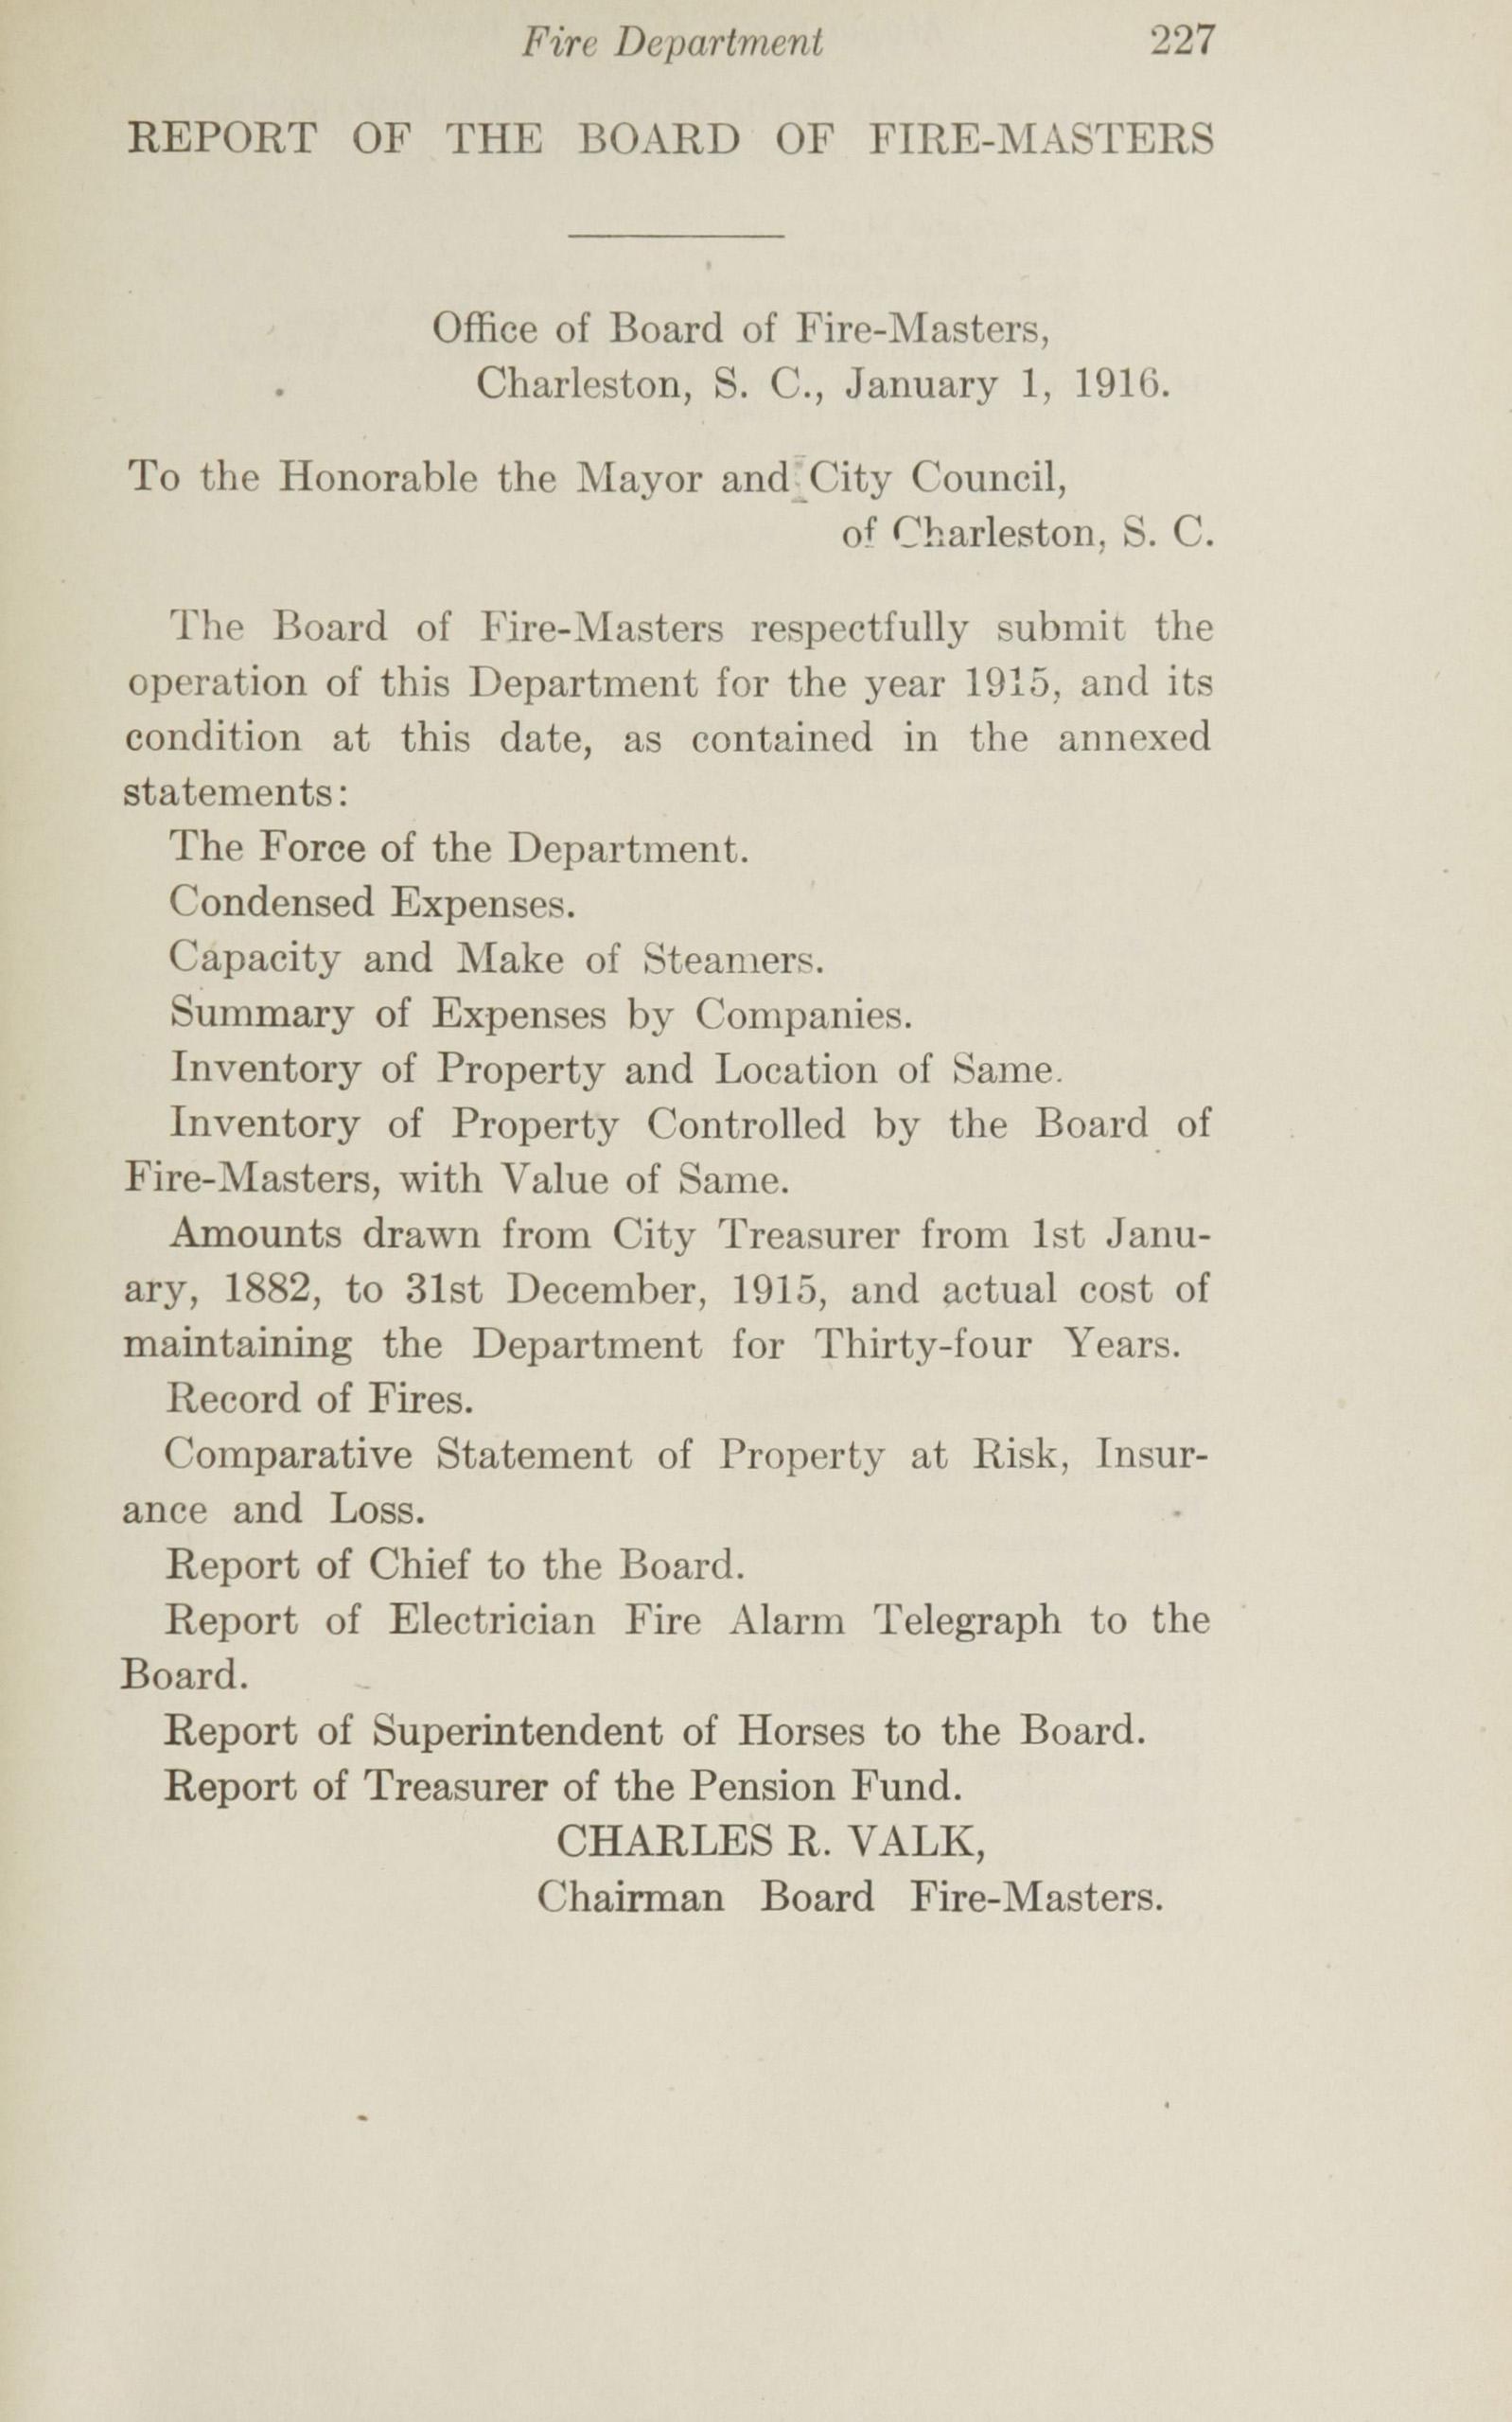 Charleston Yearbook, 1915, page 227